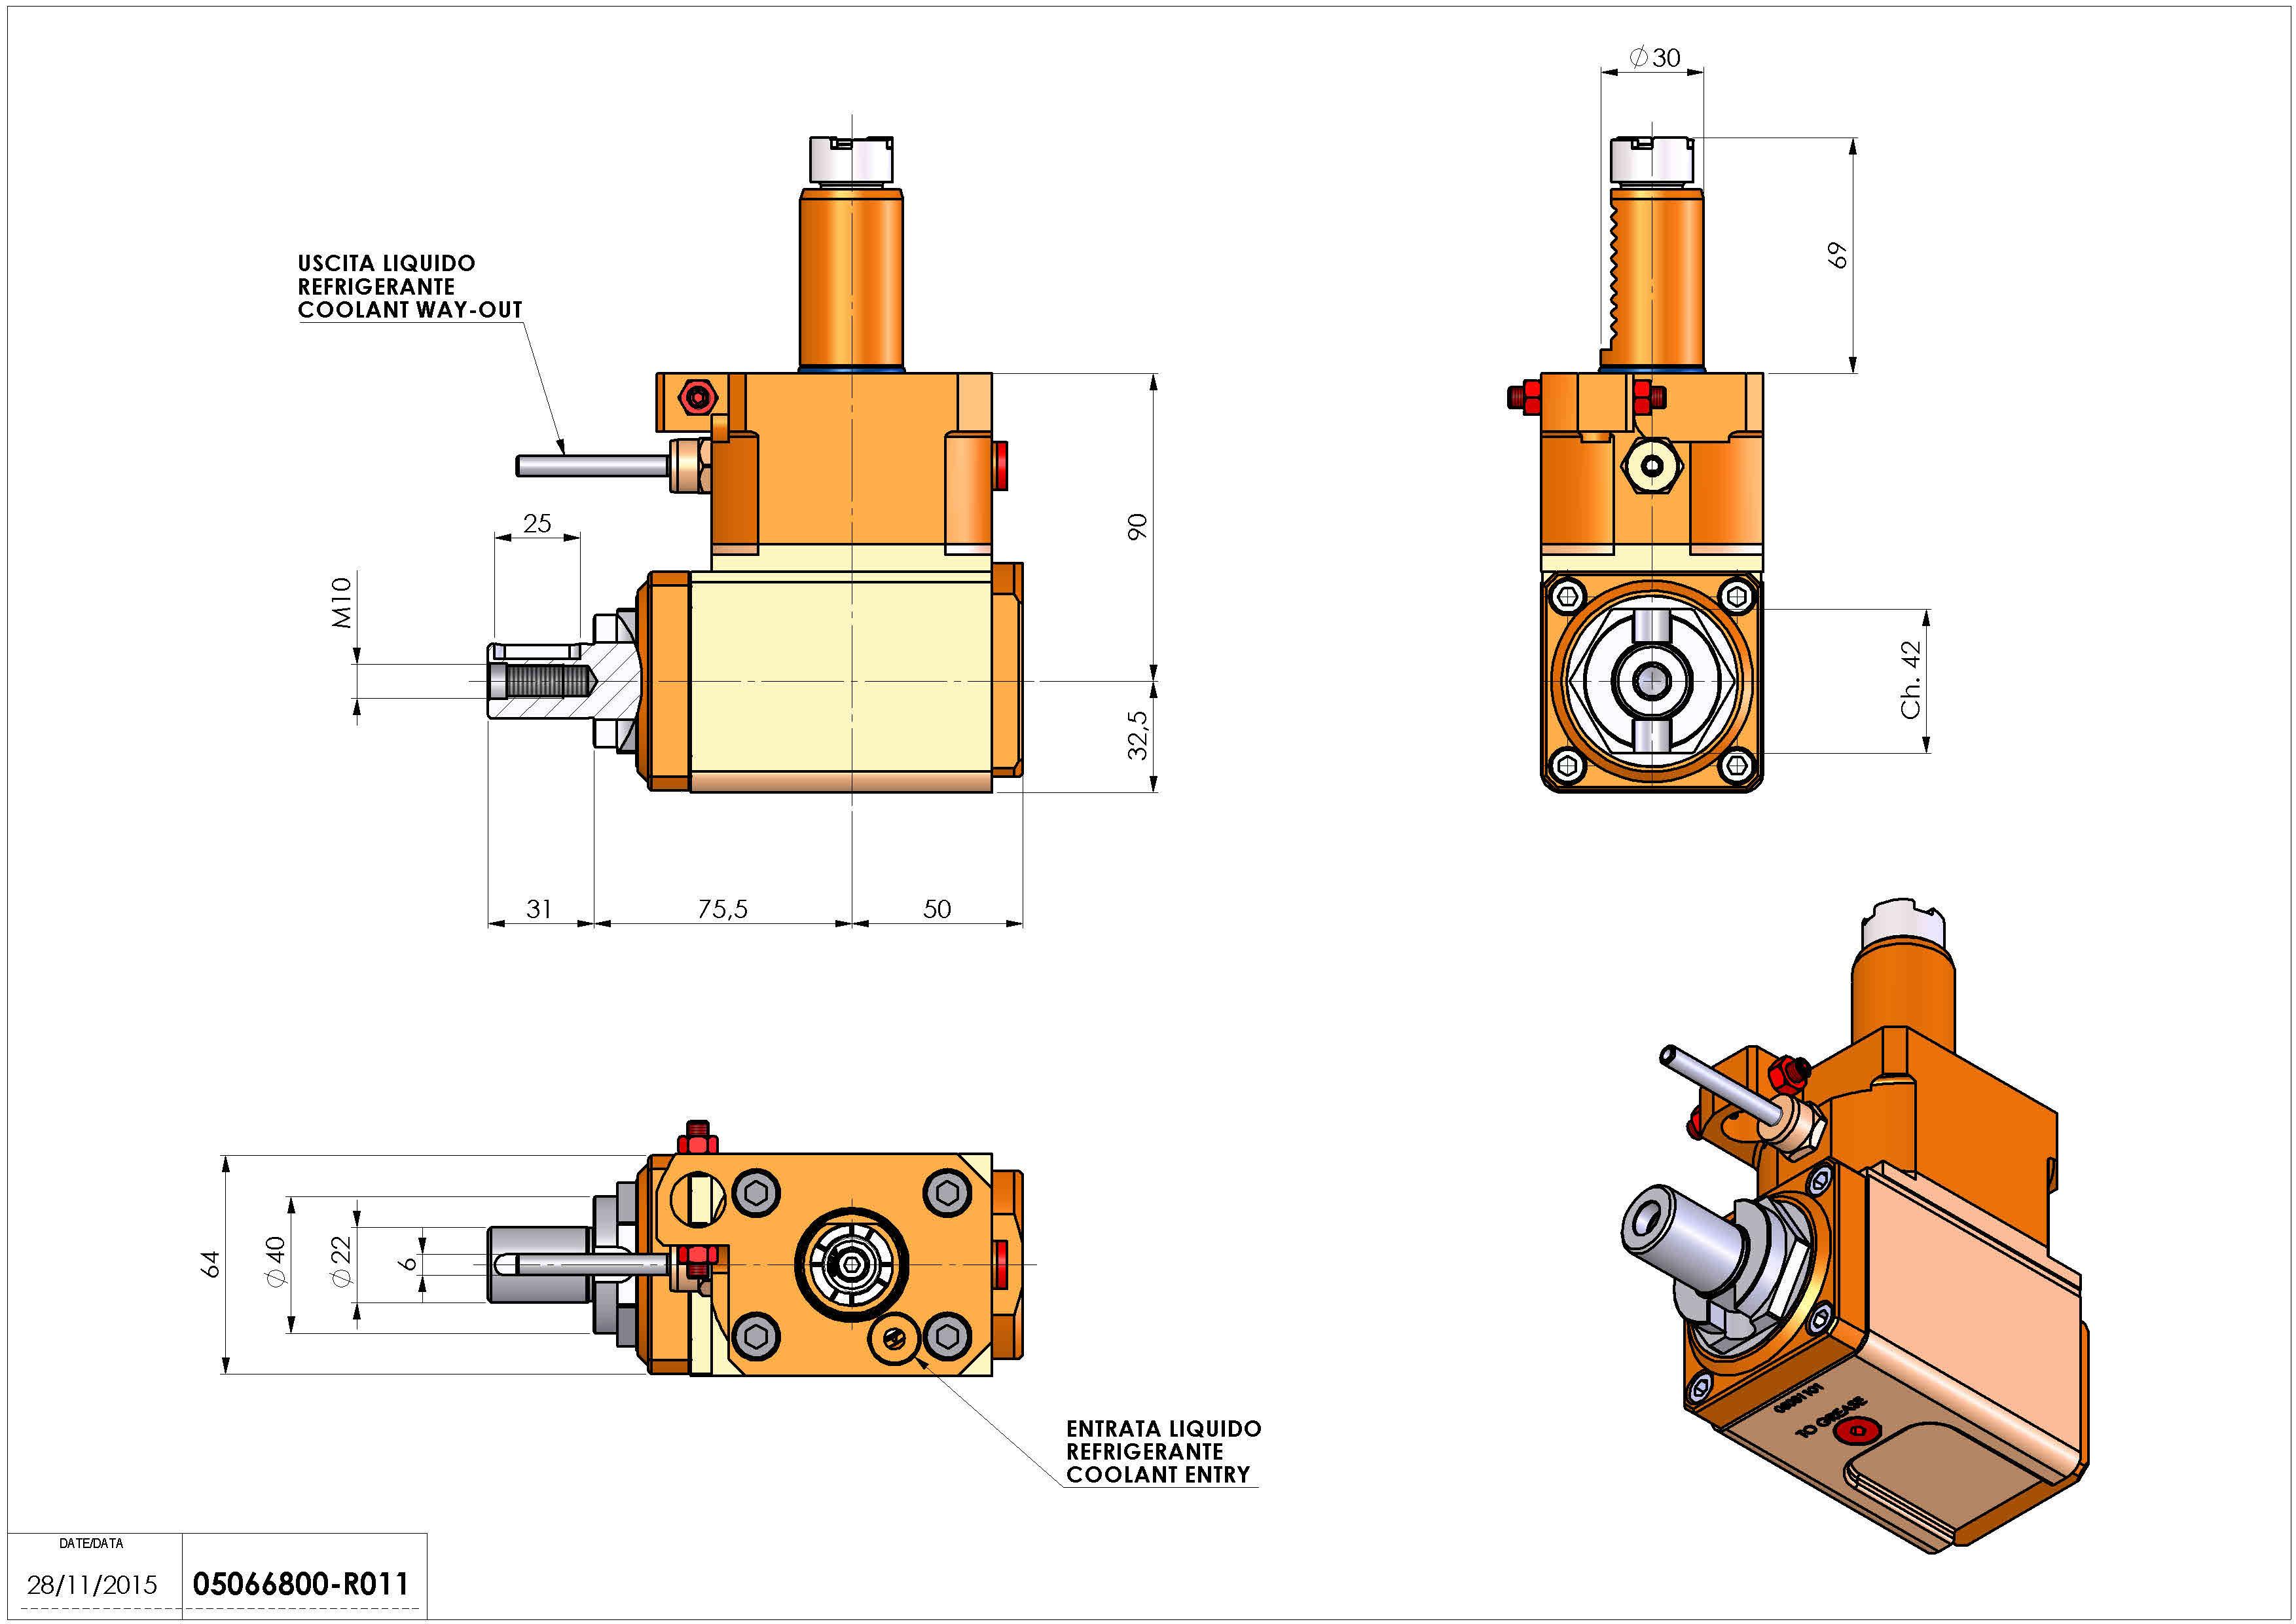 Technical image - LT-A VDI30 DIN138-22 L H90 OK.